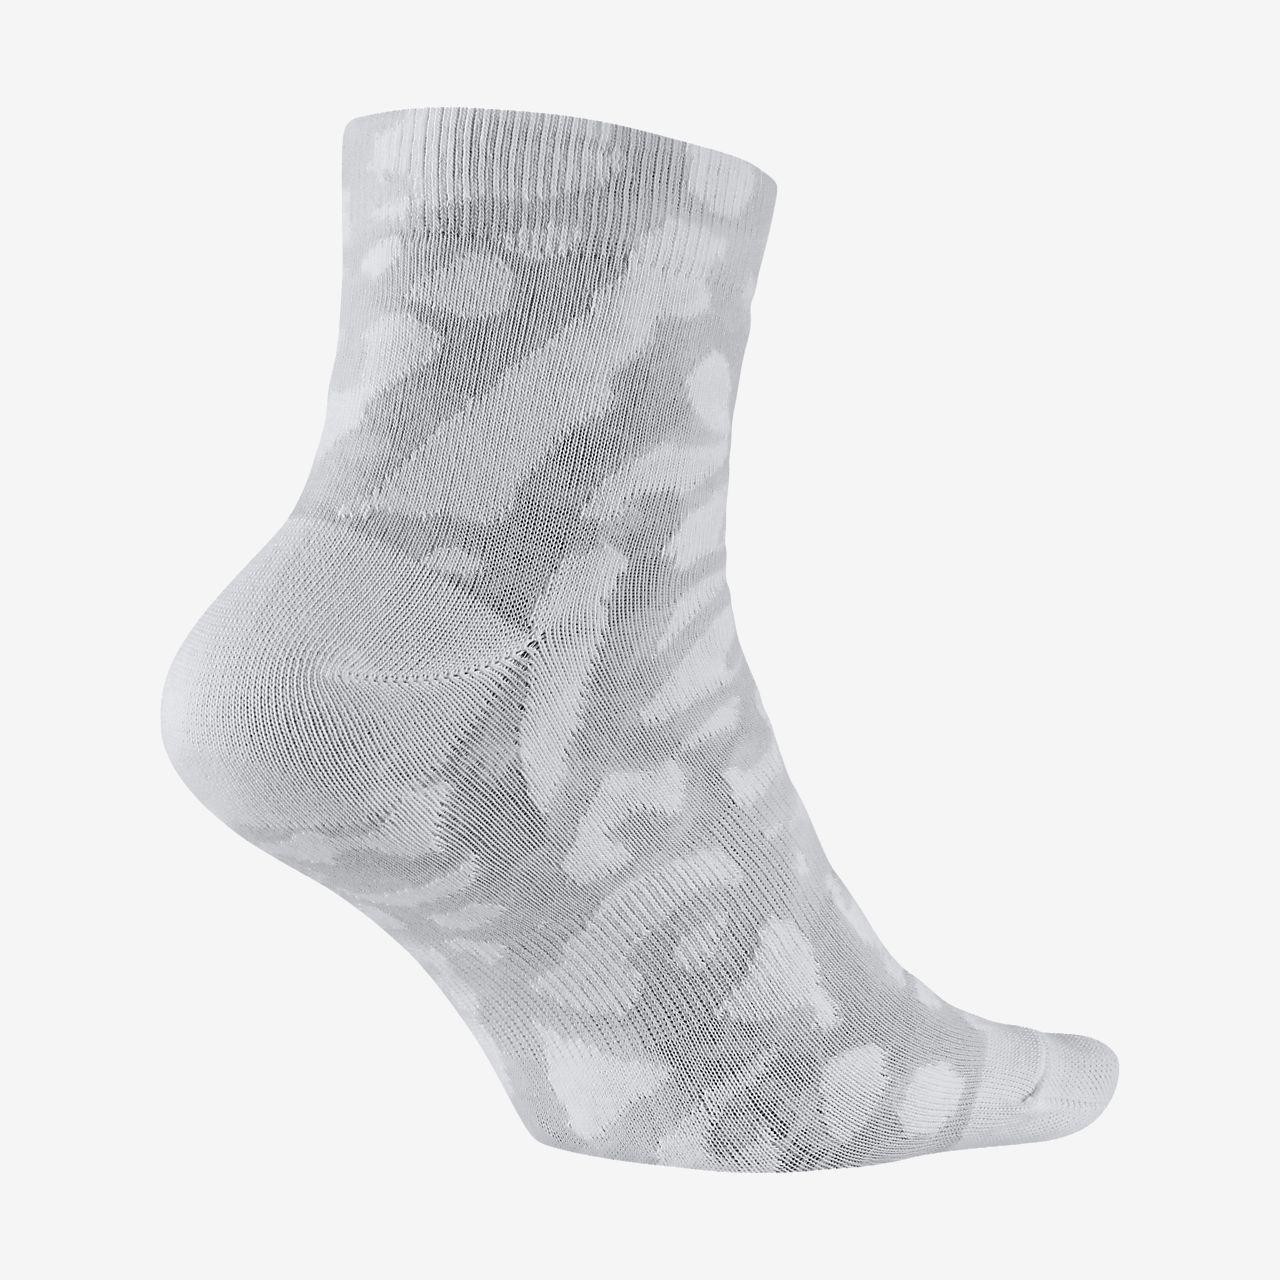 282cf9907818 Low Resolution Jordan Elephant Print Quarter Socks Jordan Elephant Print  Quarter Socks